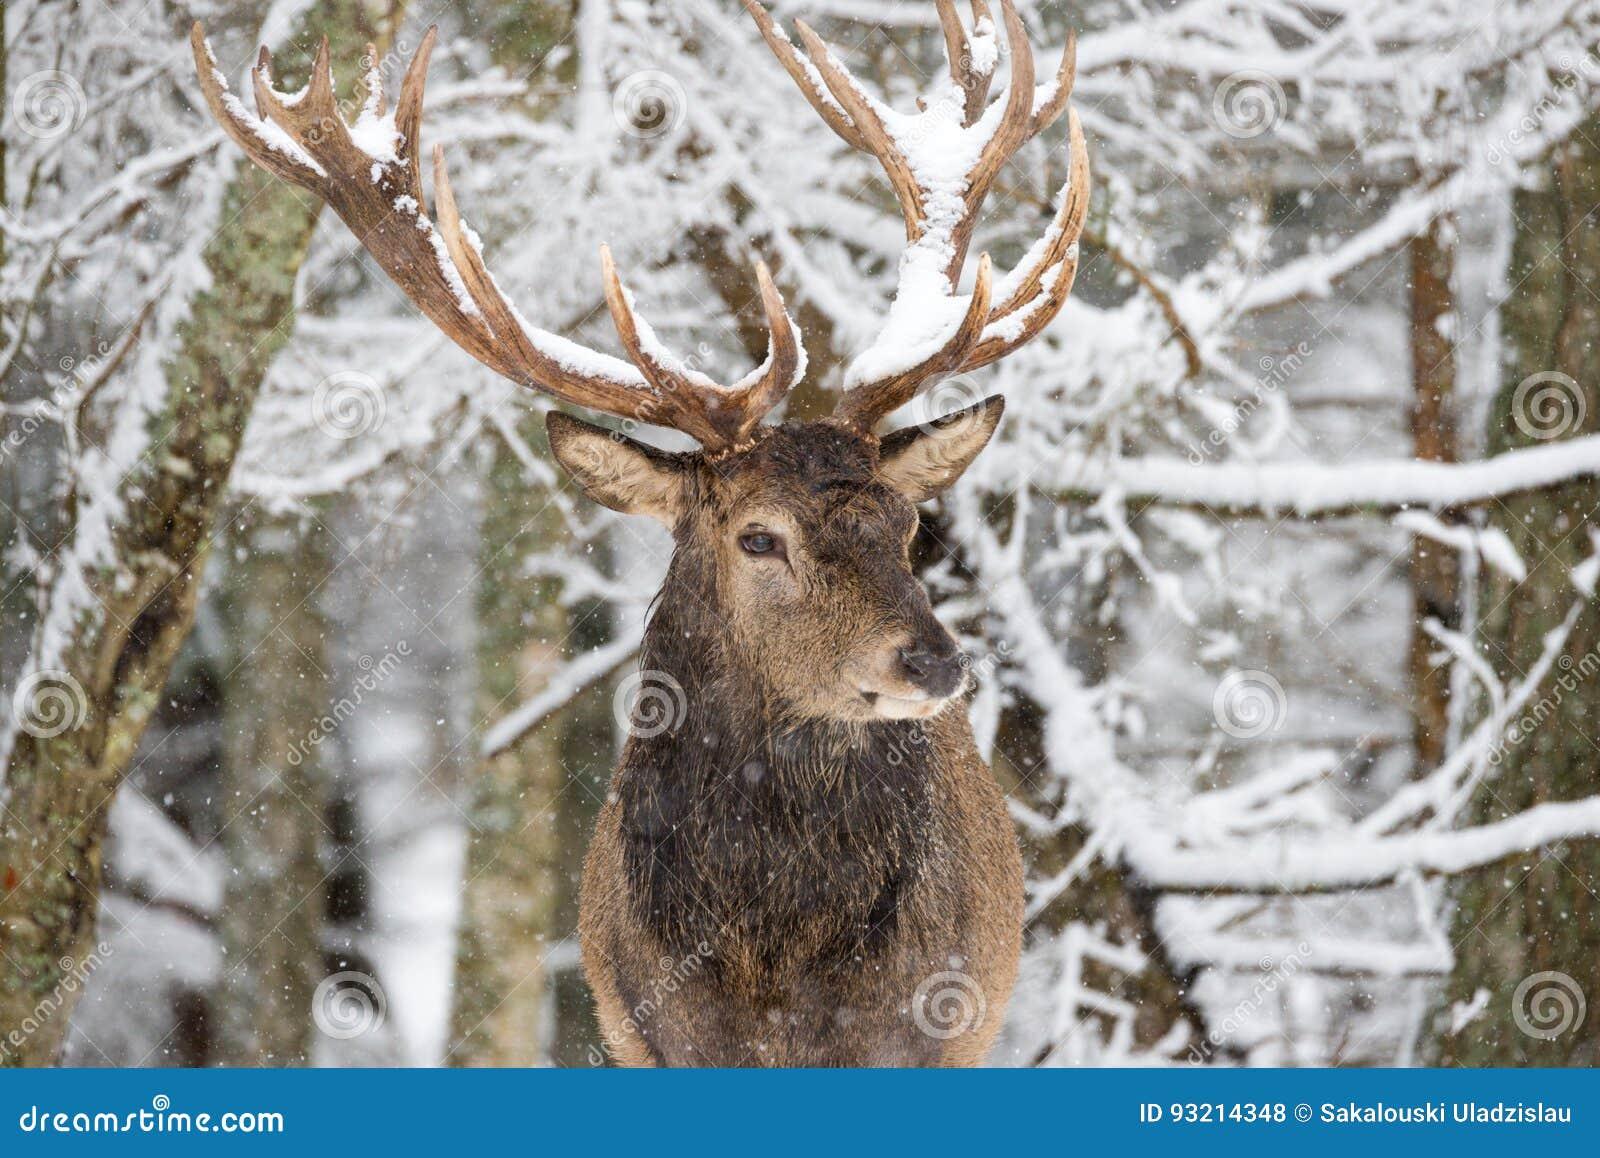 Single-Horned Deer Excites Fantasy Fans - CBS News